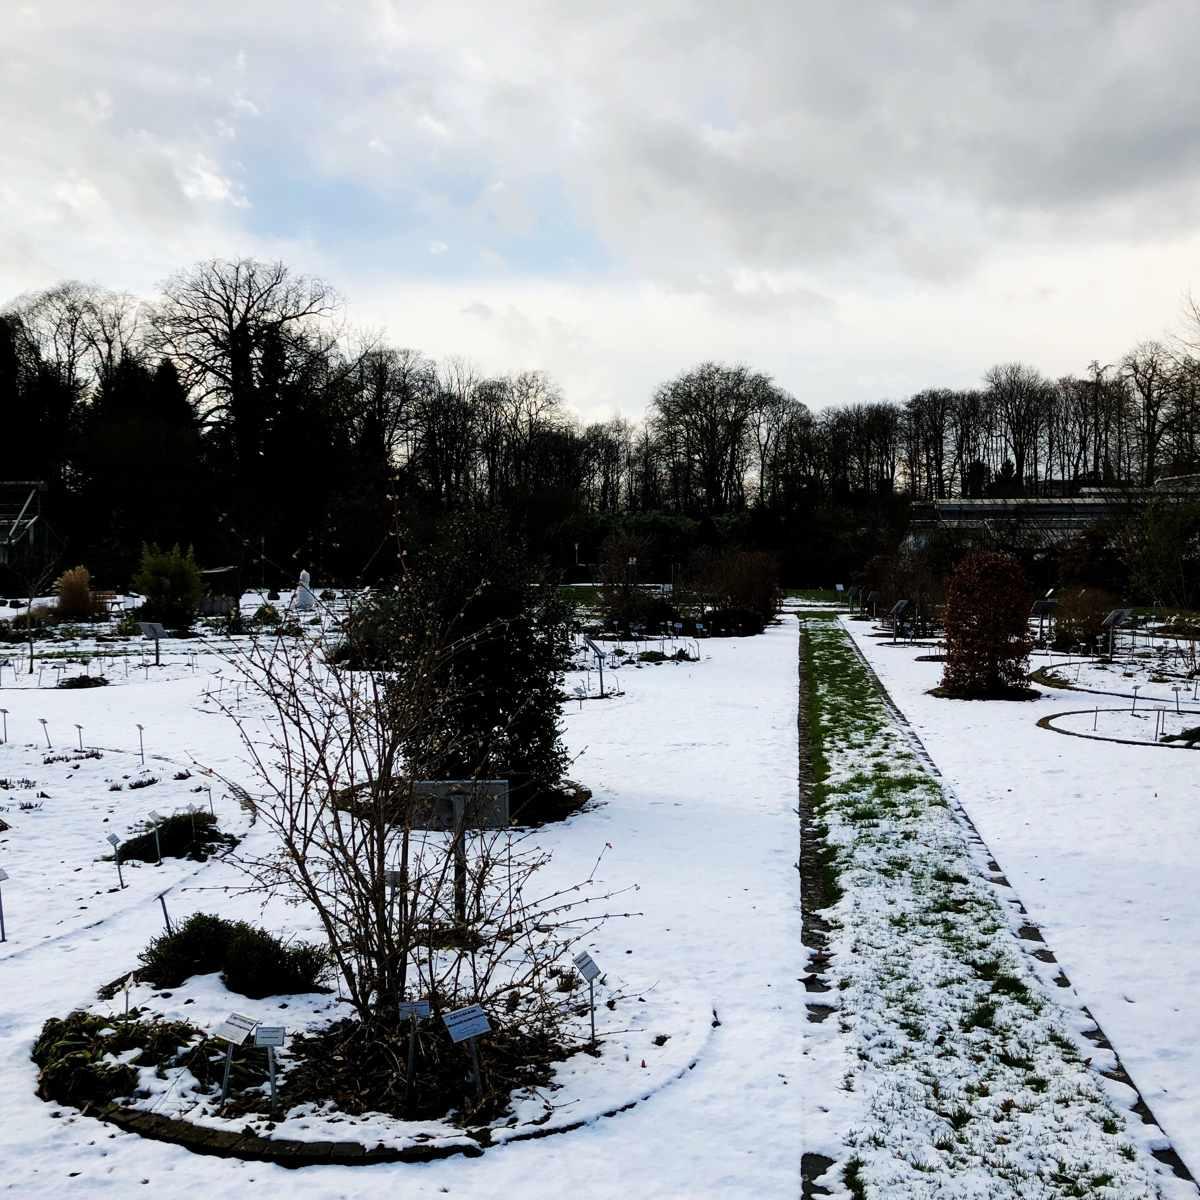 Gartenplanung im Winter [GTD Foto]